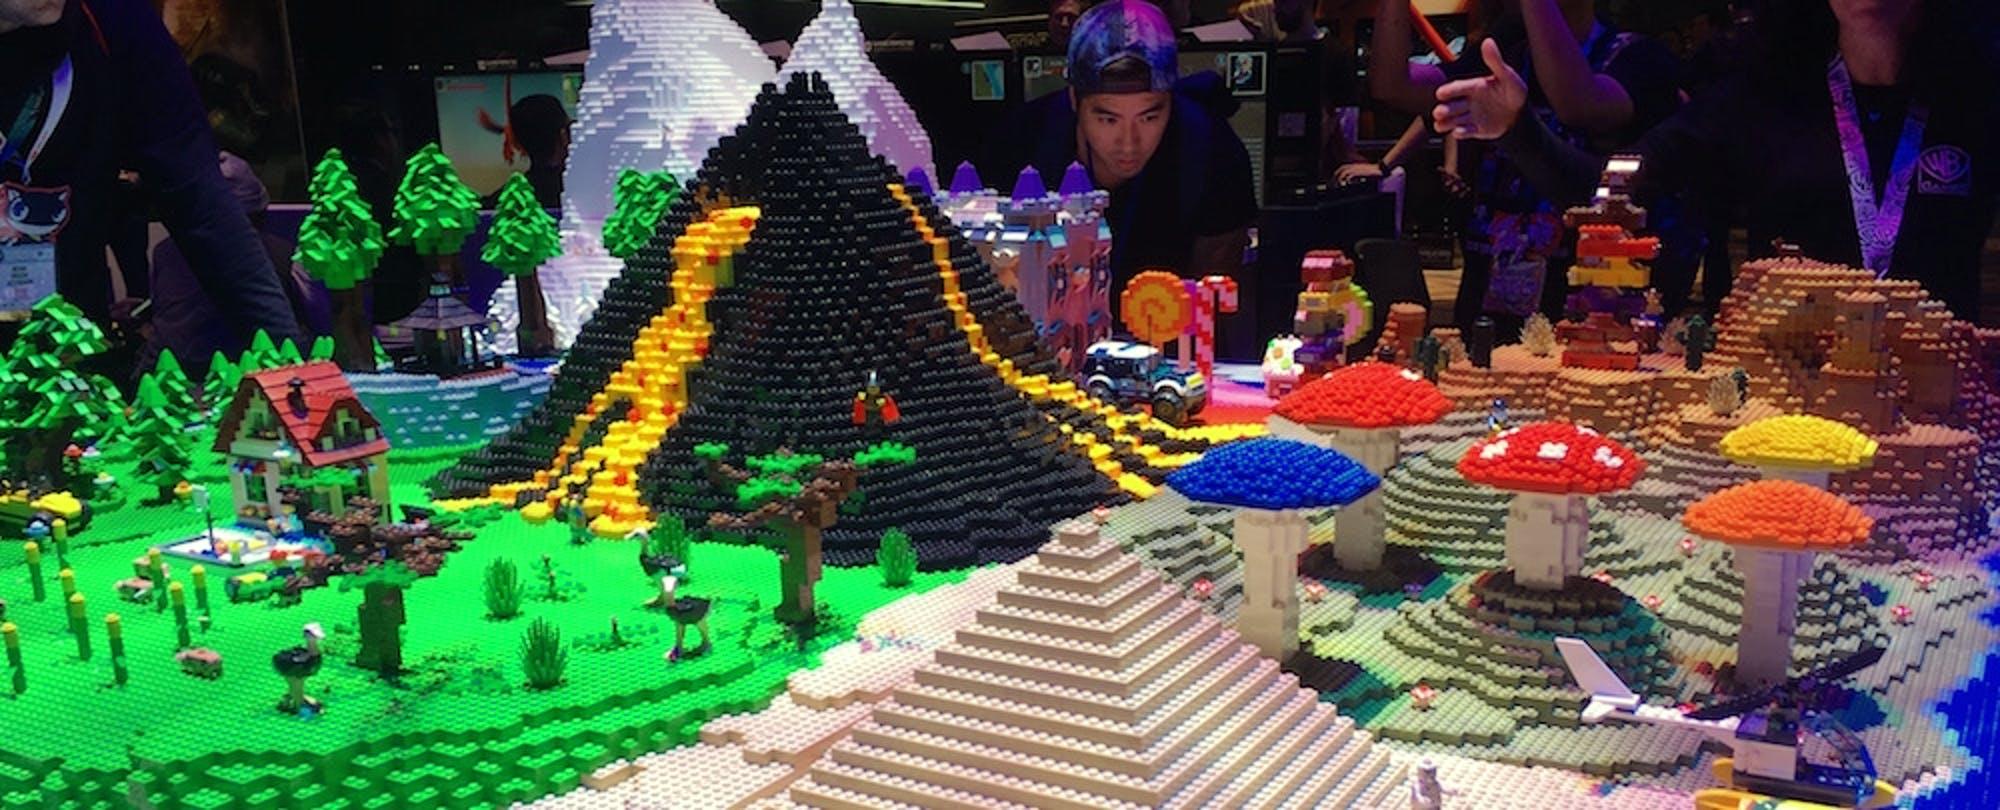 LEGO Worlds, Civilization VI and Gamer-Learner Testimonials: Education at E3